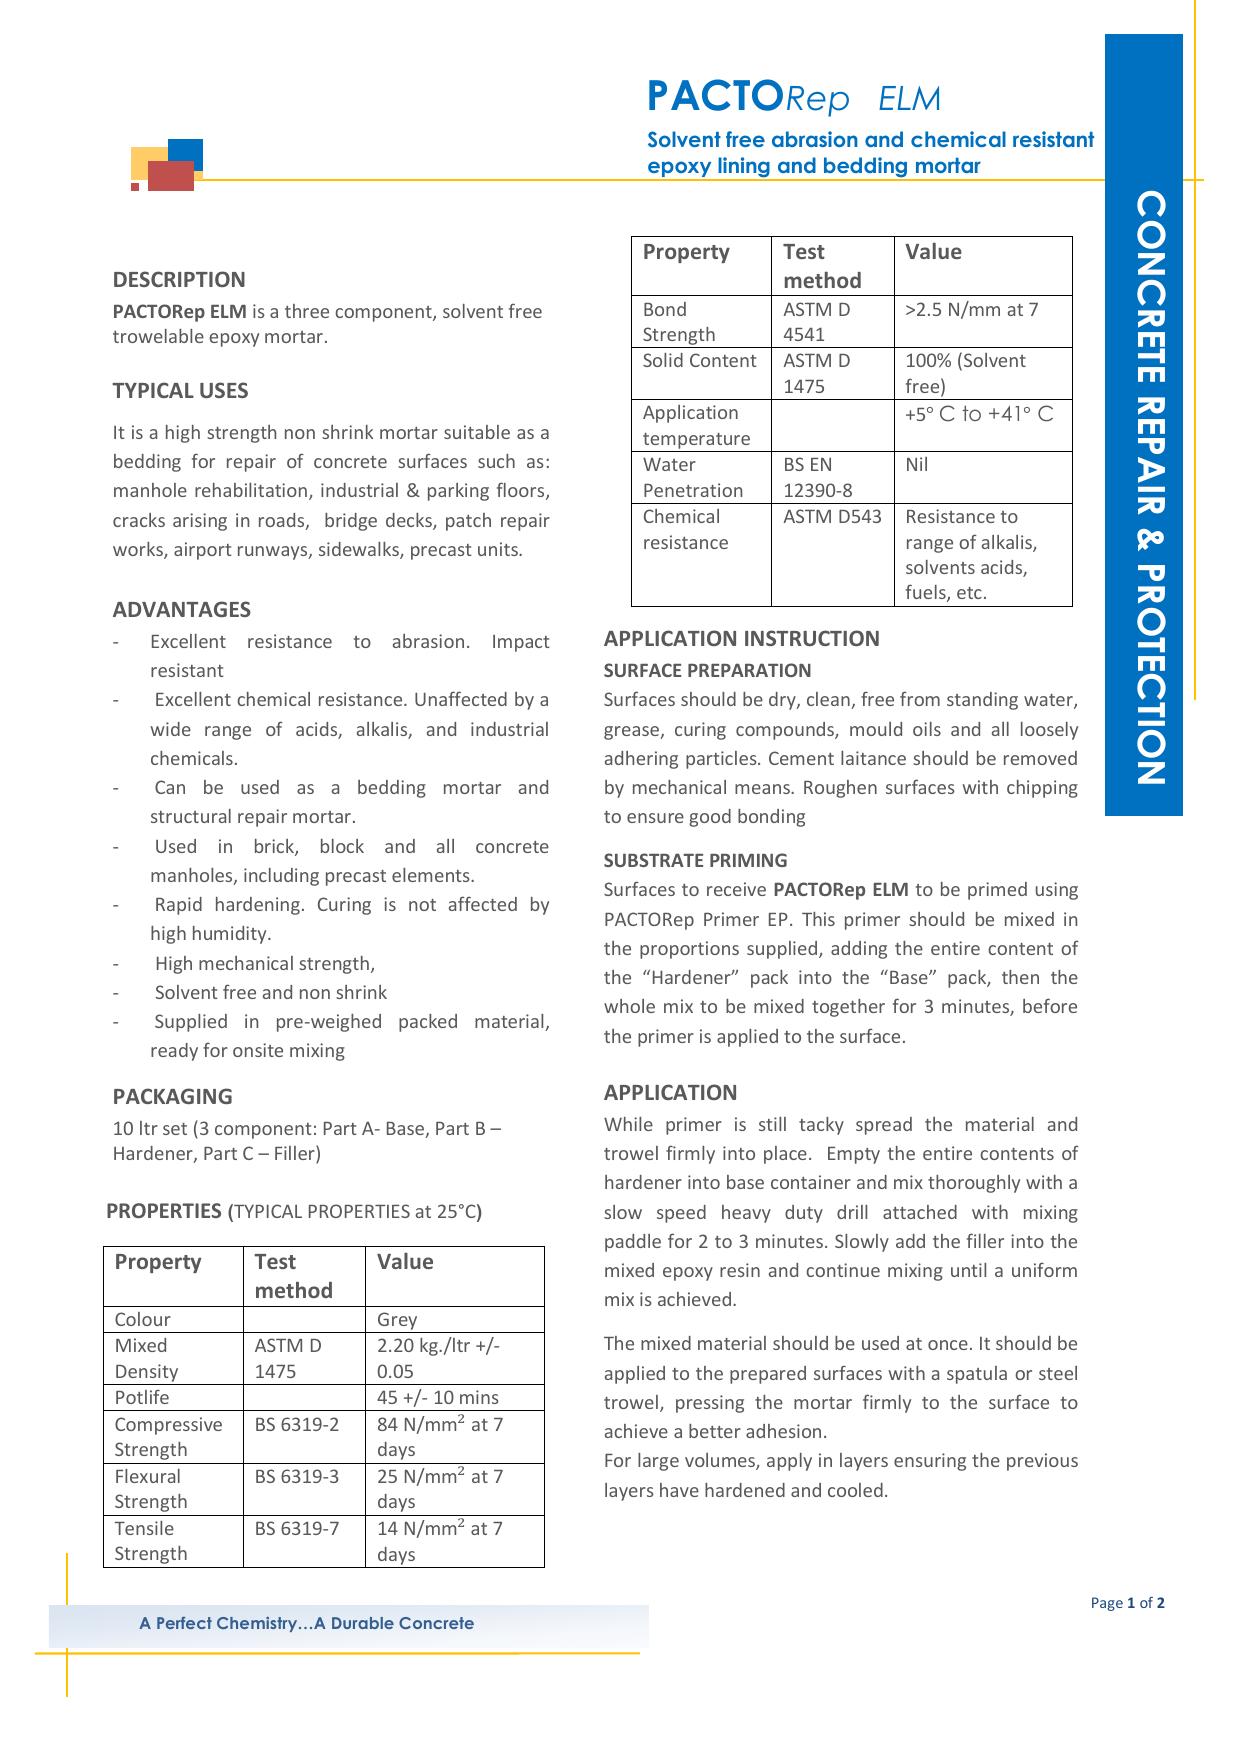 PACTORep ELM - PAC Technologies | manualzz com